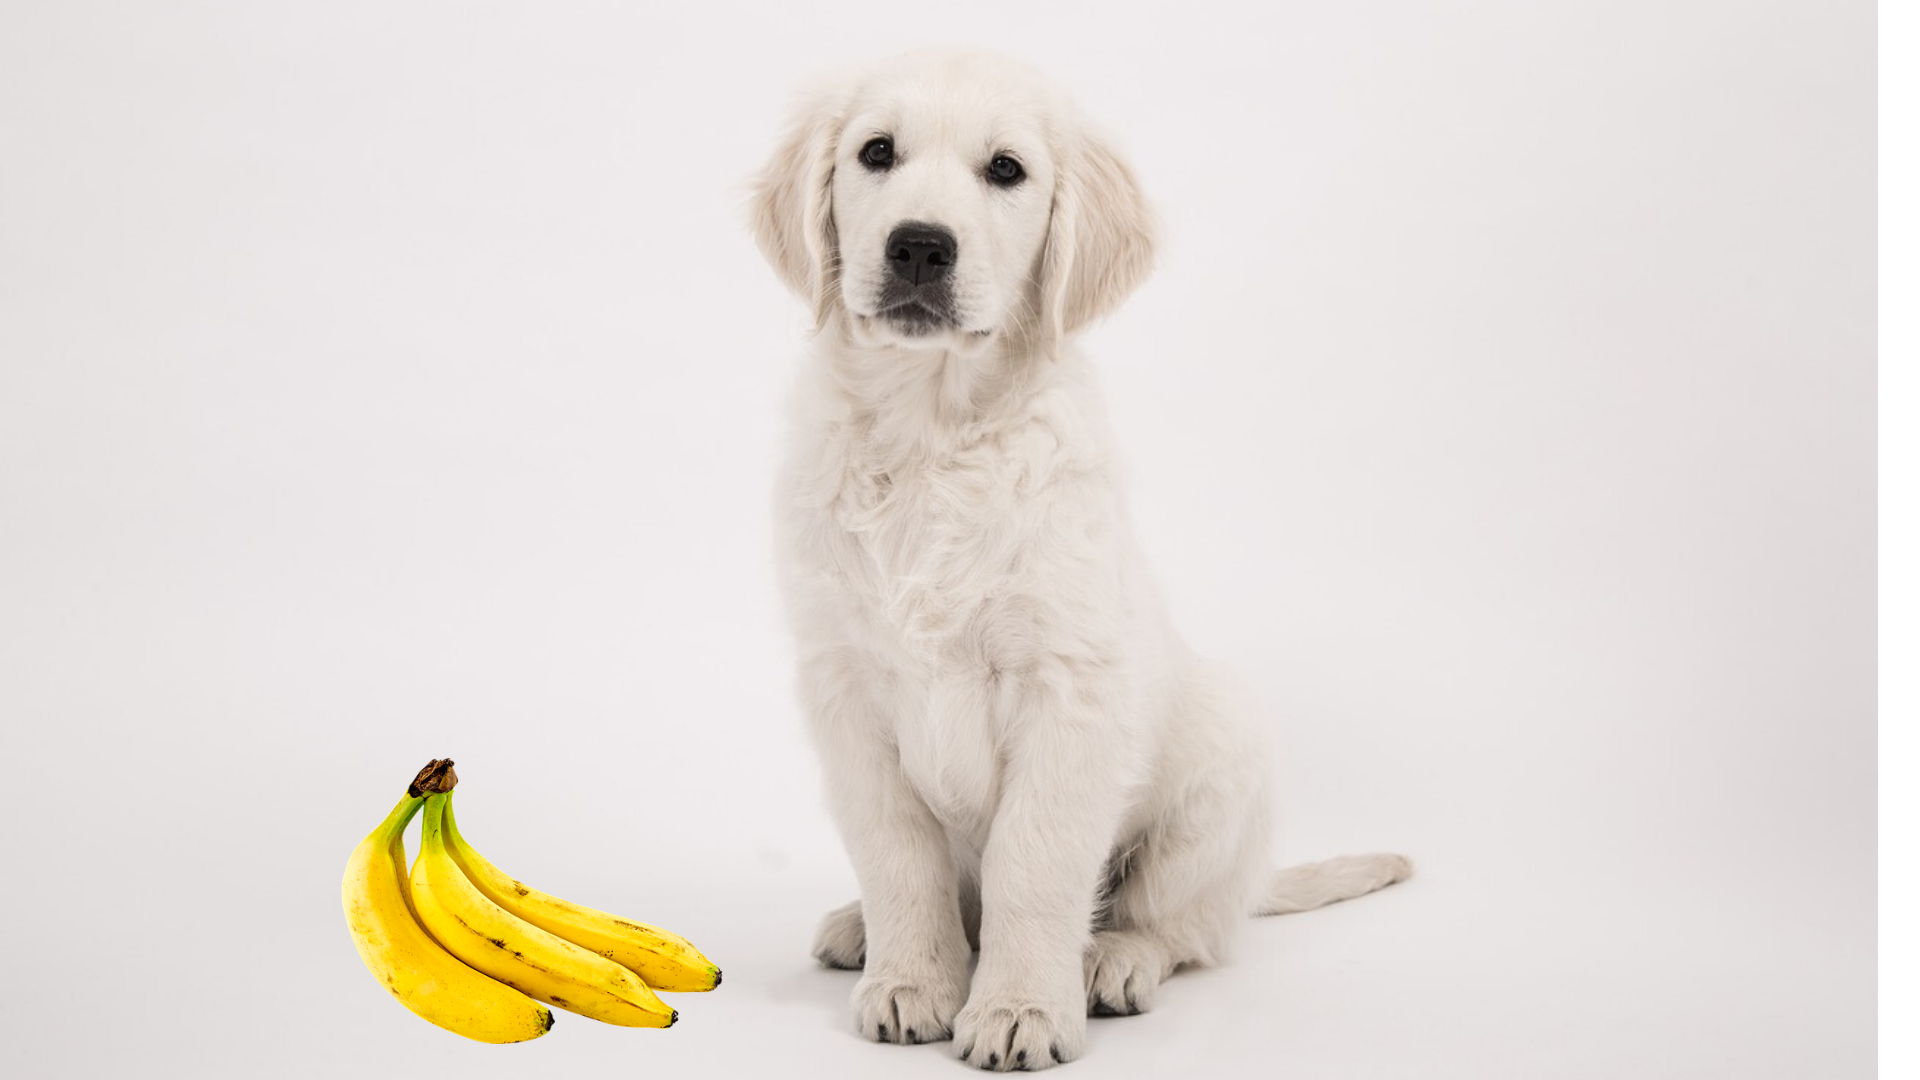 Can Golden Retrievers Eat Bananas